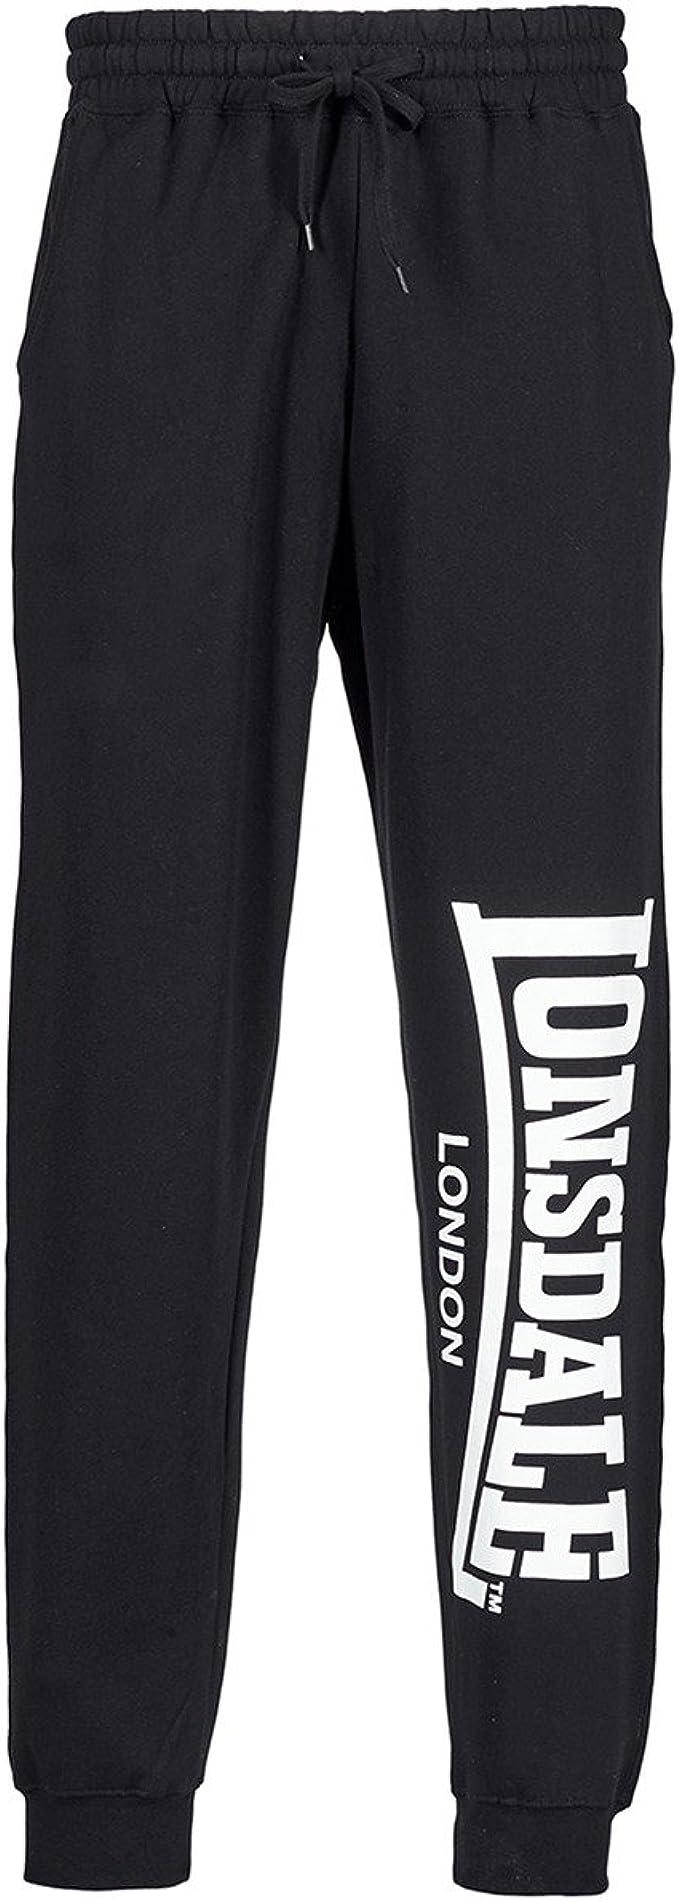 Lonsdale London Giffordland - Pantalones de chándal para Hombre ...